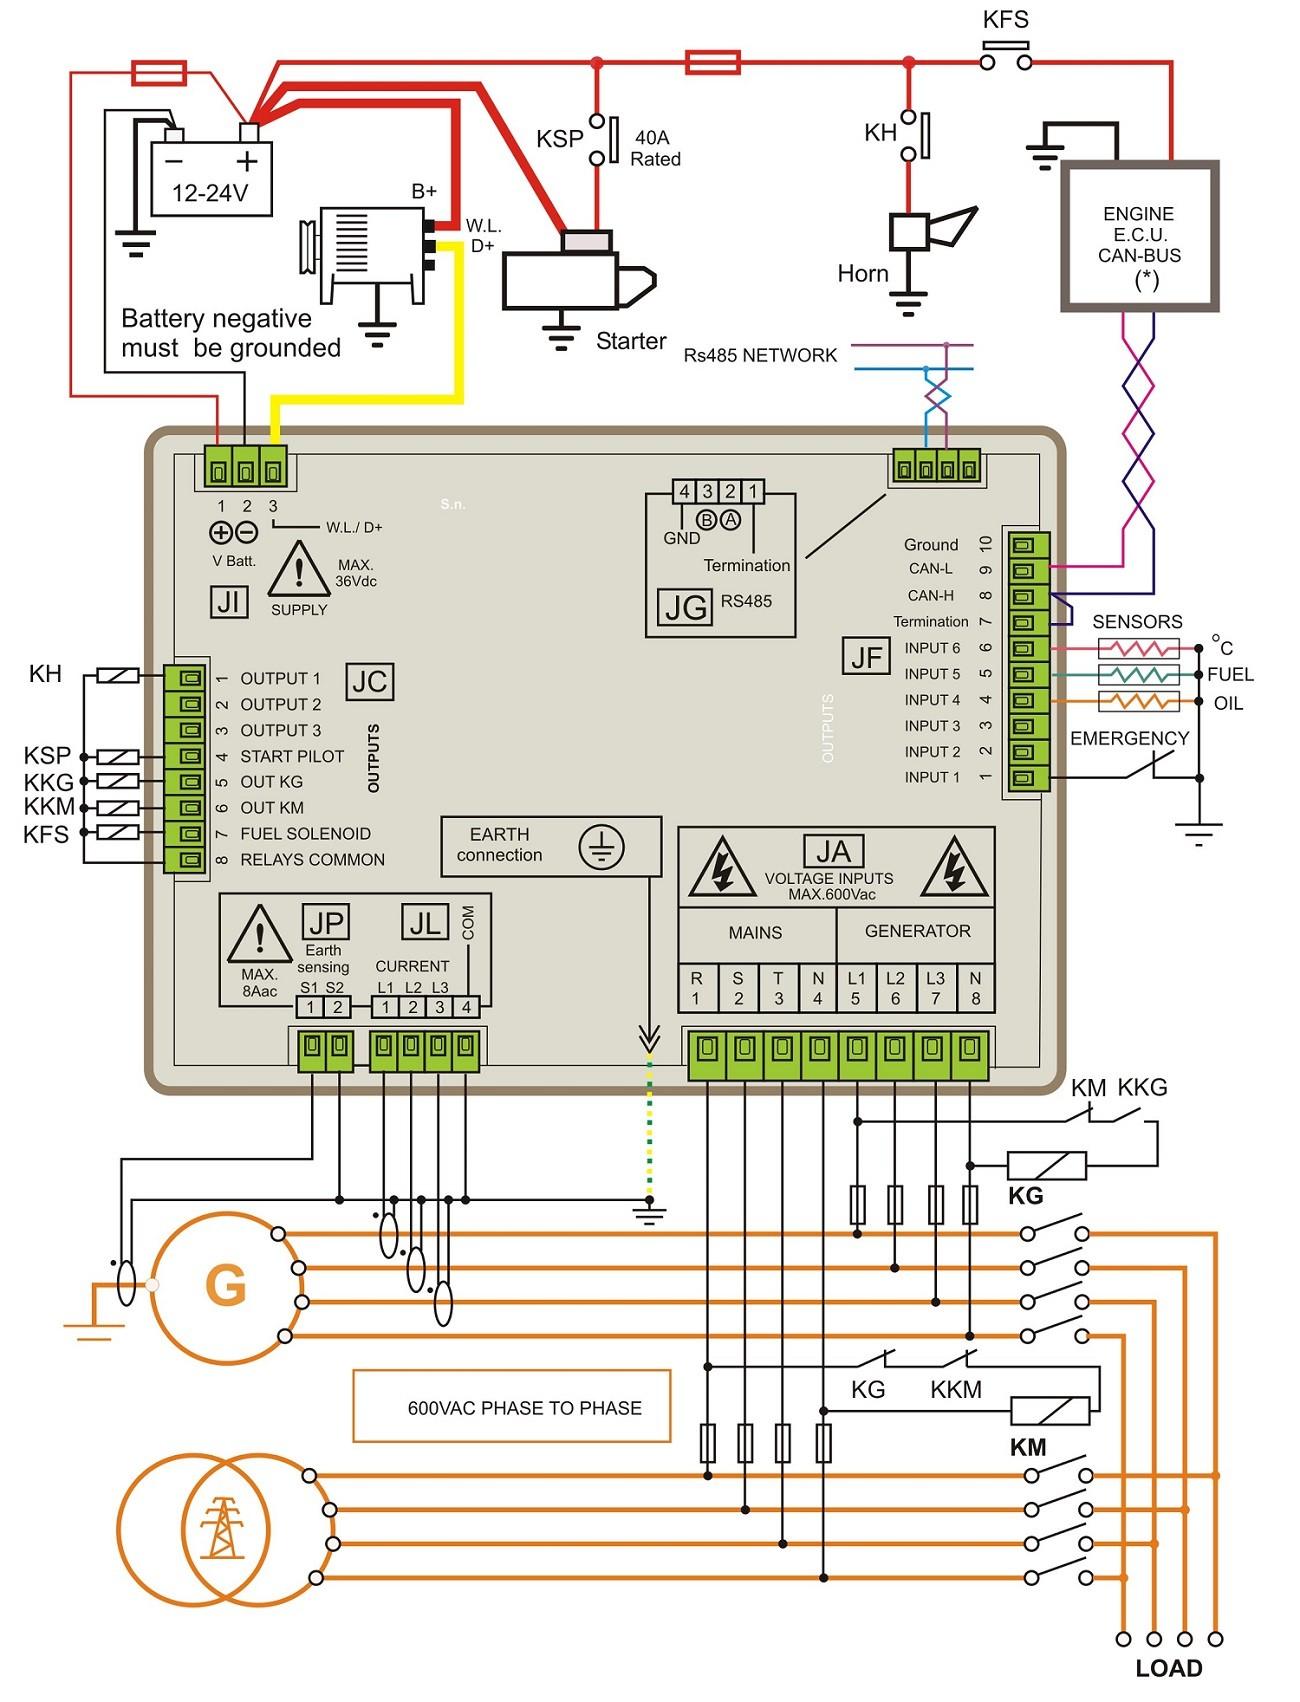 Home Generator Wiring Diagram Generator Control Panel Manufacturers – Genset Controller Of Home Generator Wiring Diagram